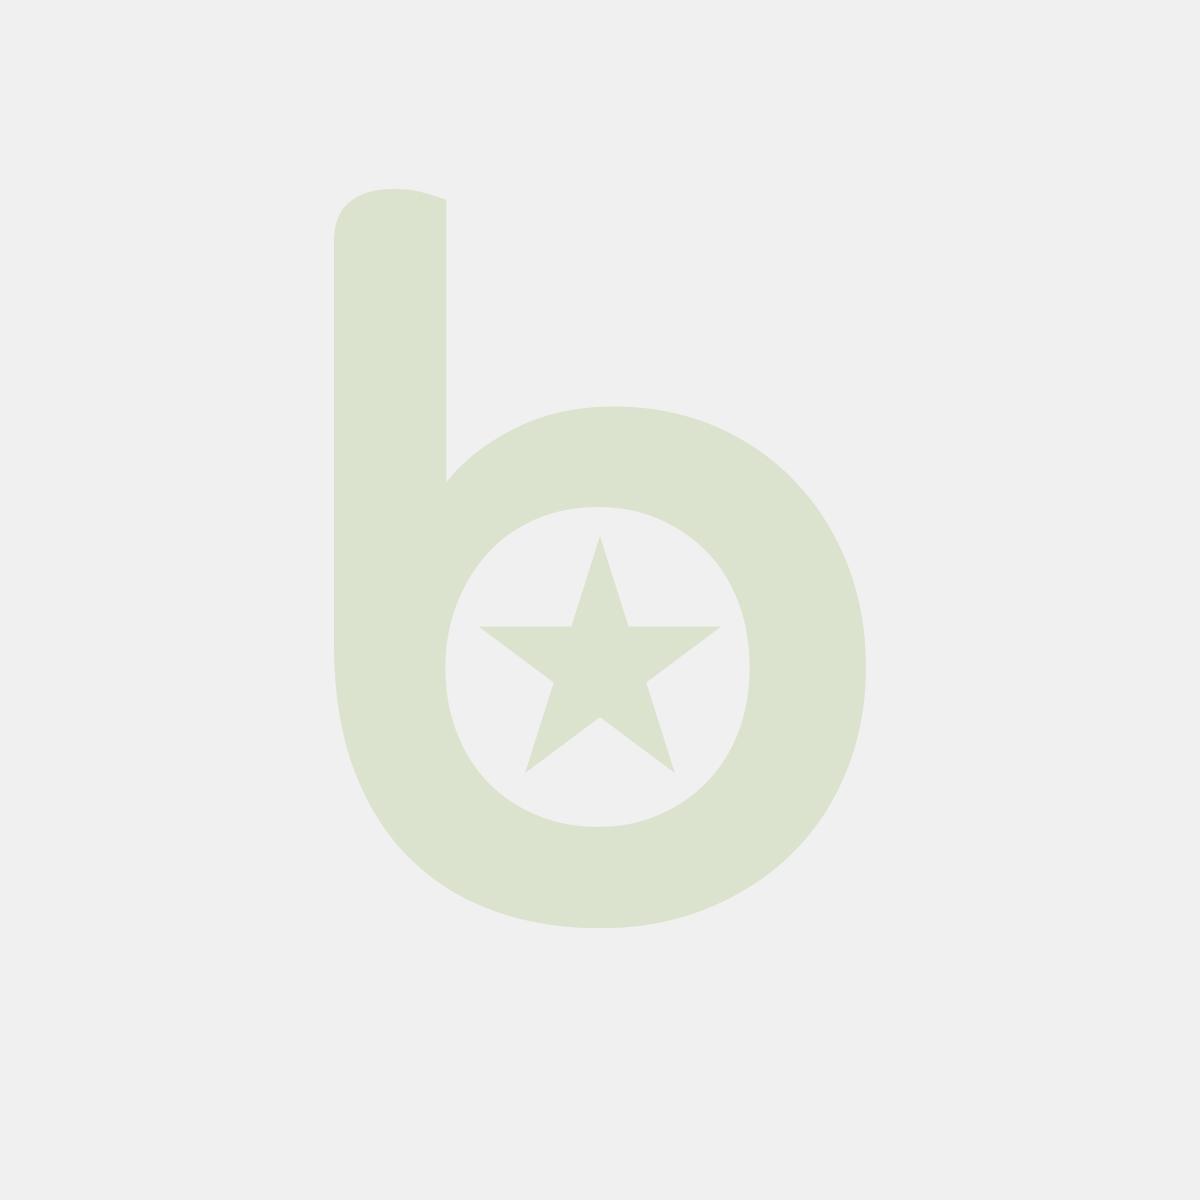 Serwetki PAPSTAR Royal Collection New Mediterran 40x40 oliwka1/4 opakowanie 50szt (5)